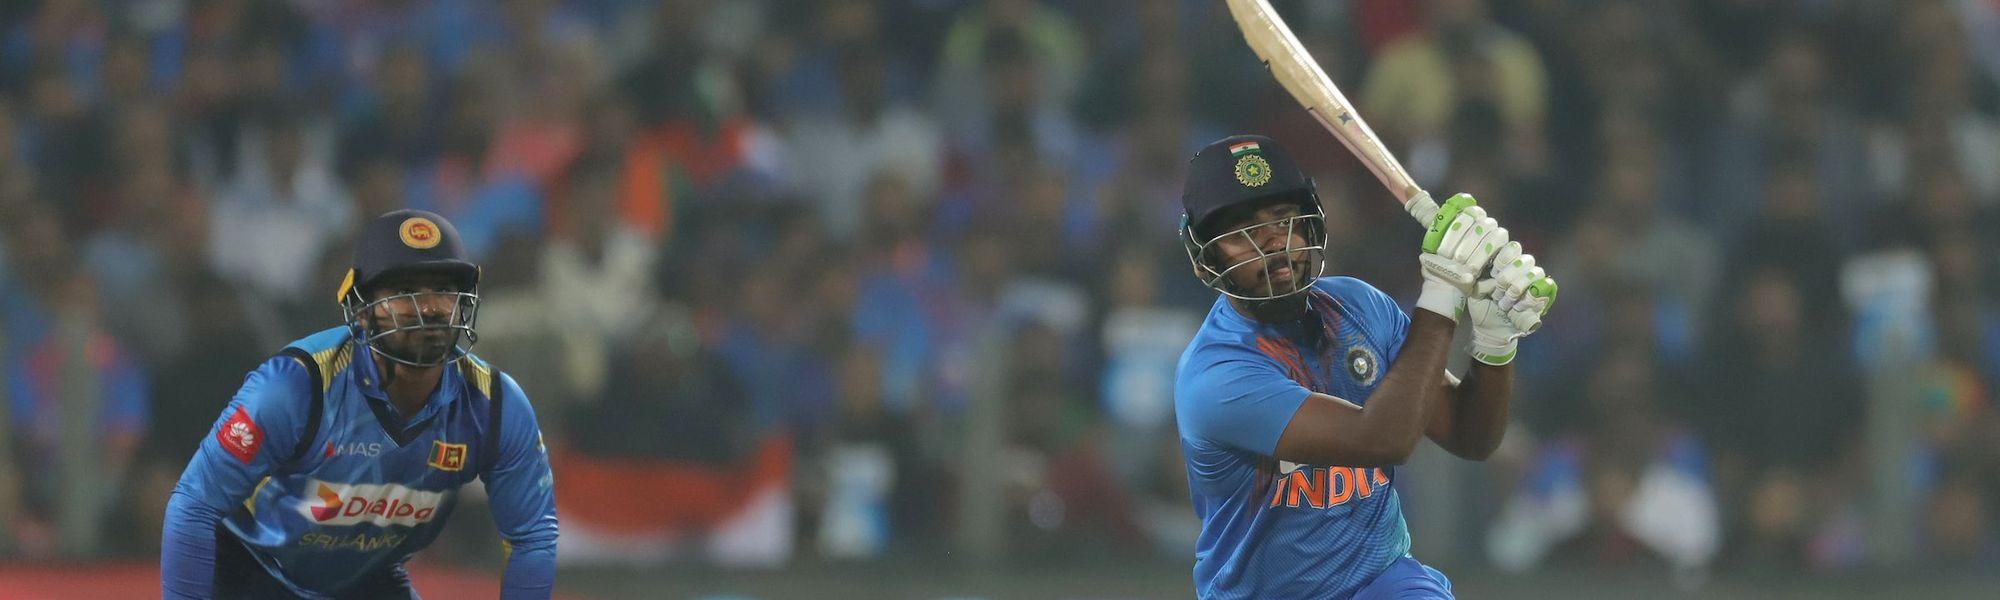 Sanju Samson made a long-awaited return to T20I cricket during India's recent series against Sri Lanka